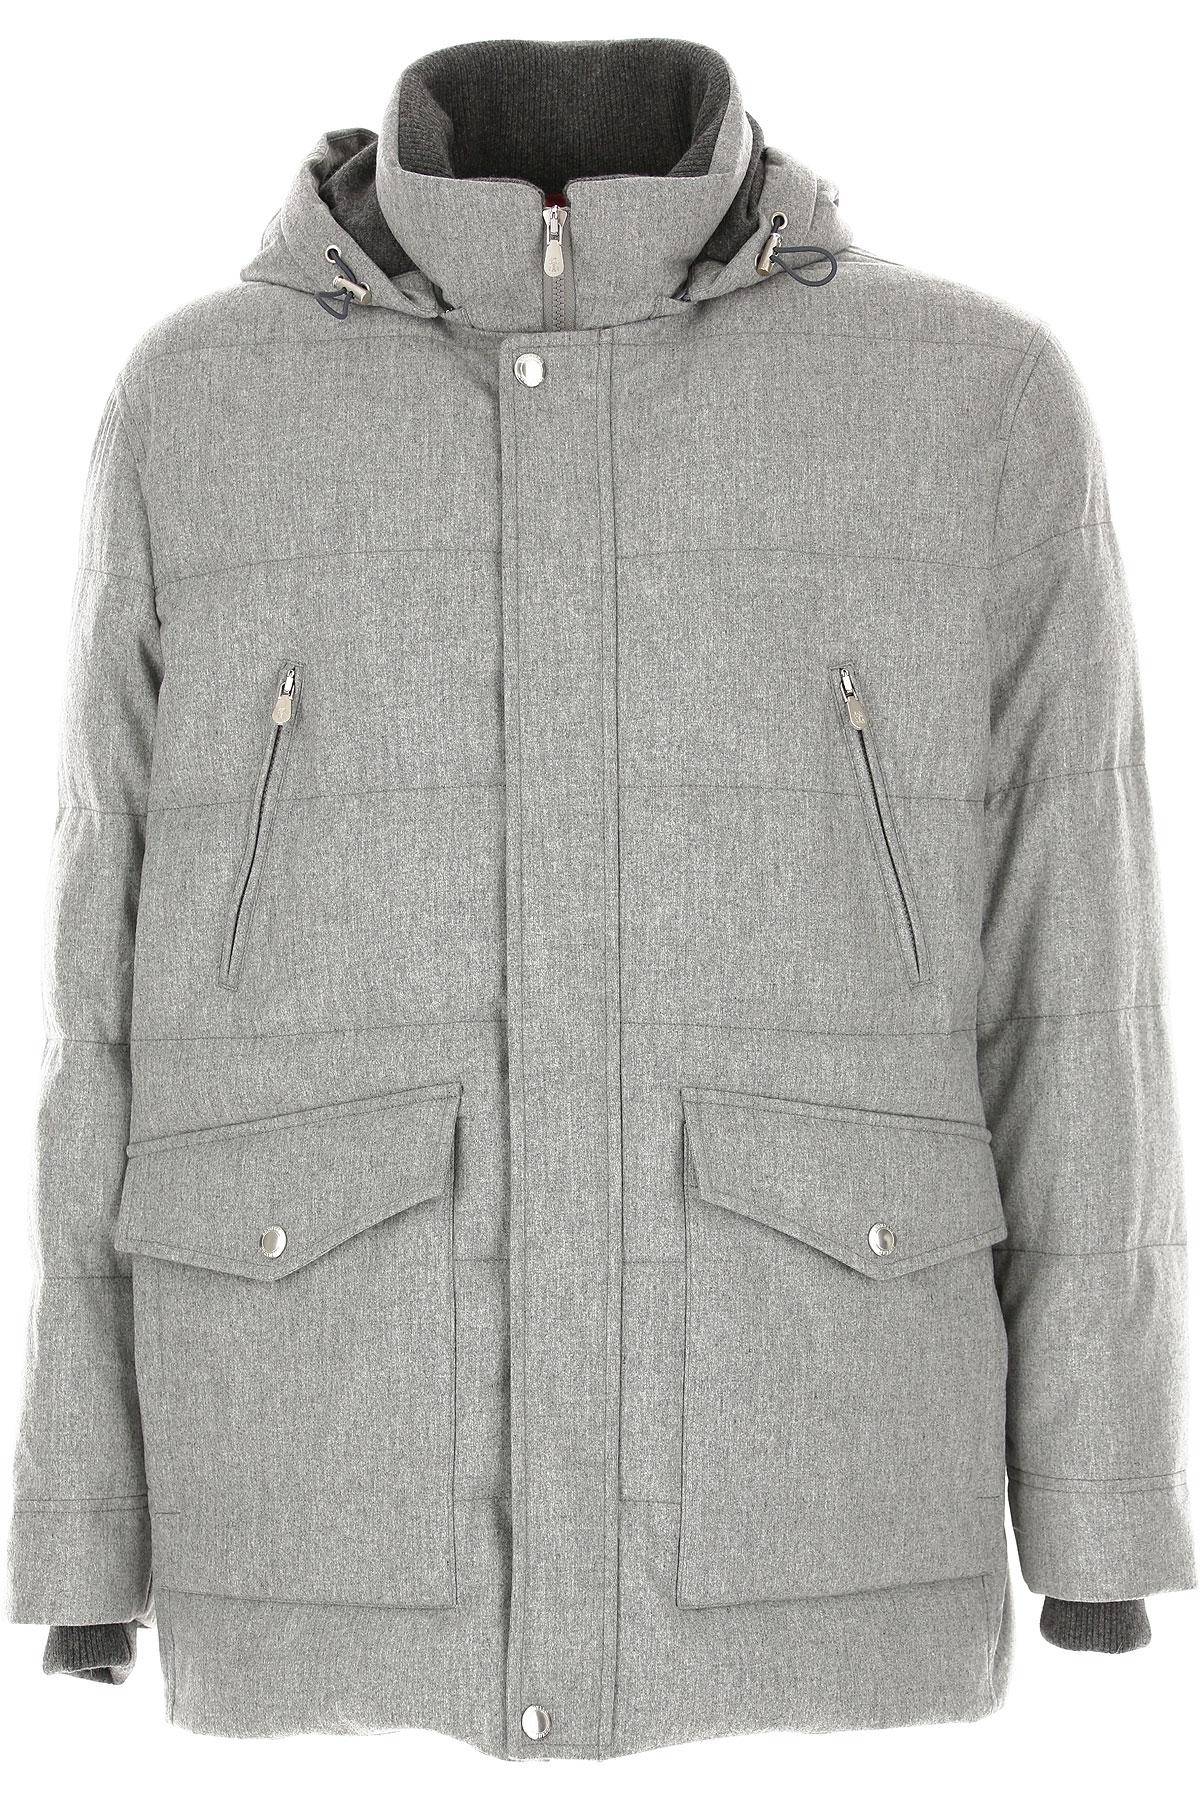 Brunello Cucinelli Jacket for Men On Sale, Grey, Wool, 2019, L M XL